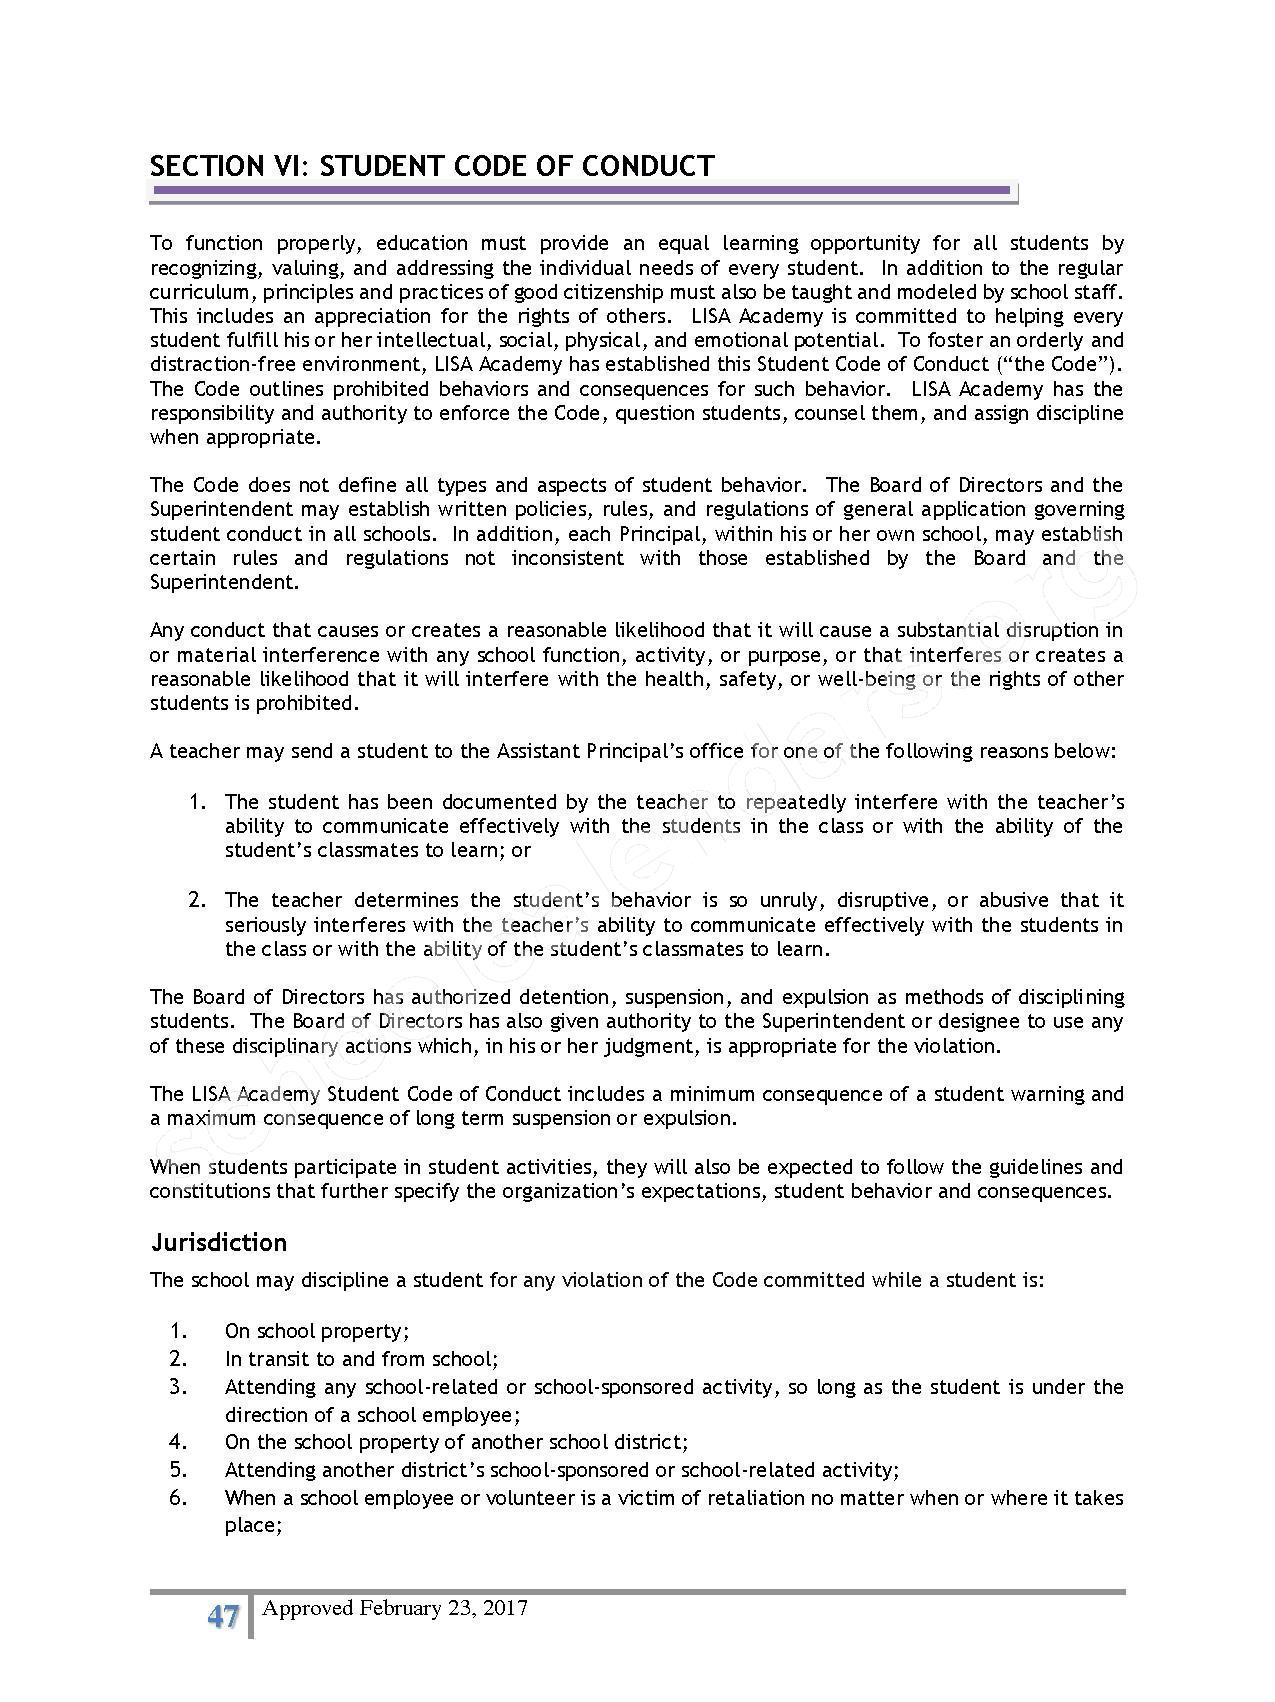 2016 - 2017 District Calendar – Lisa Academy Public Charter Schools – page 47